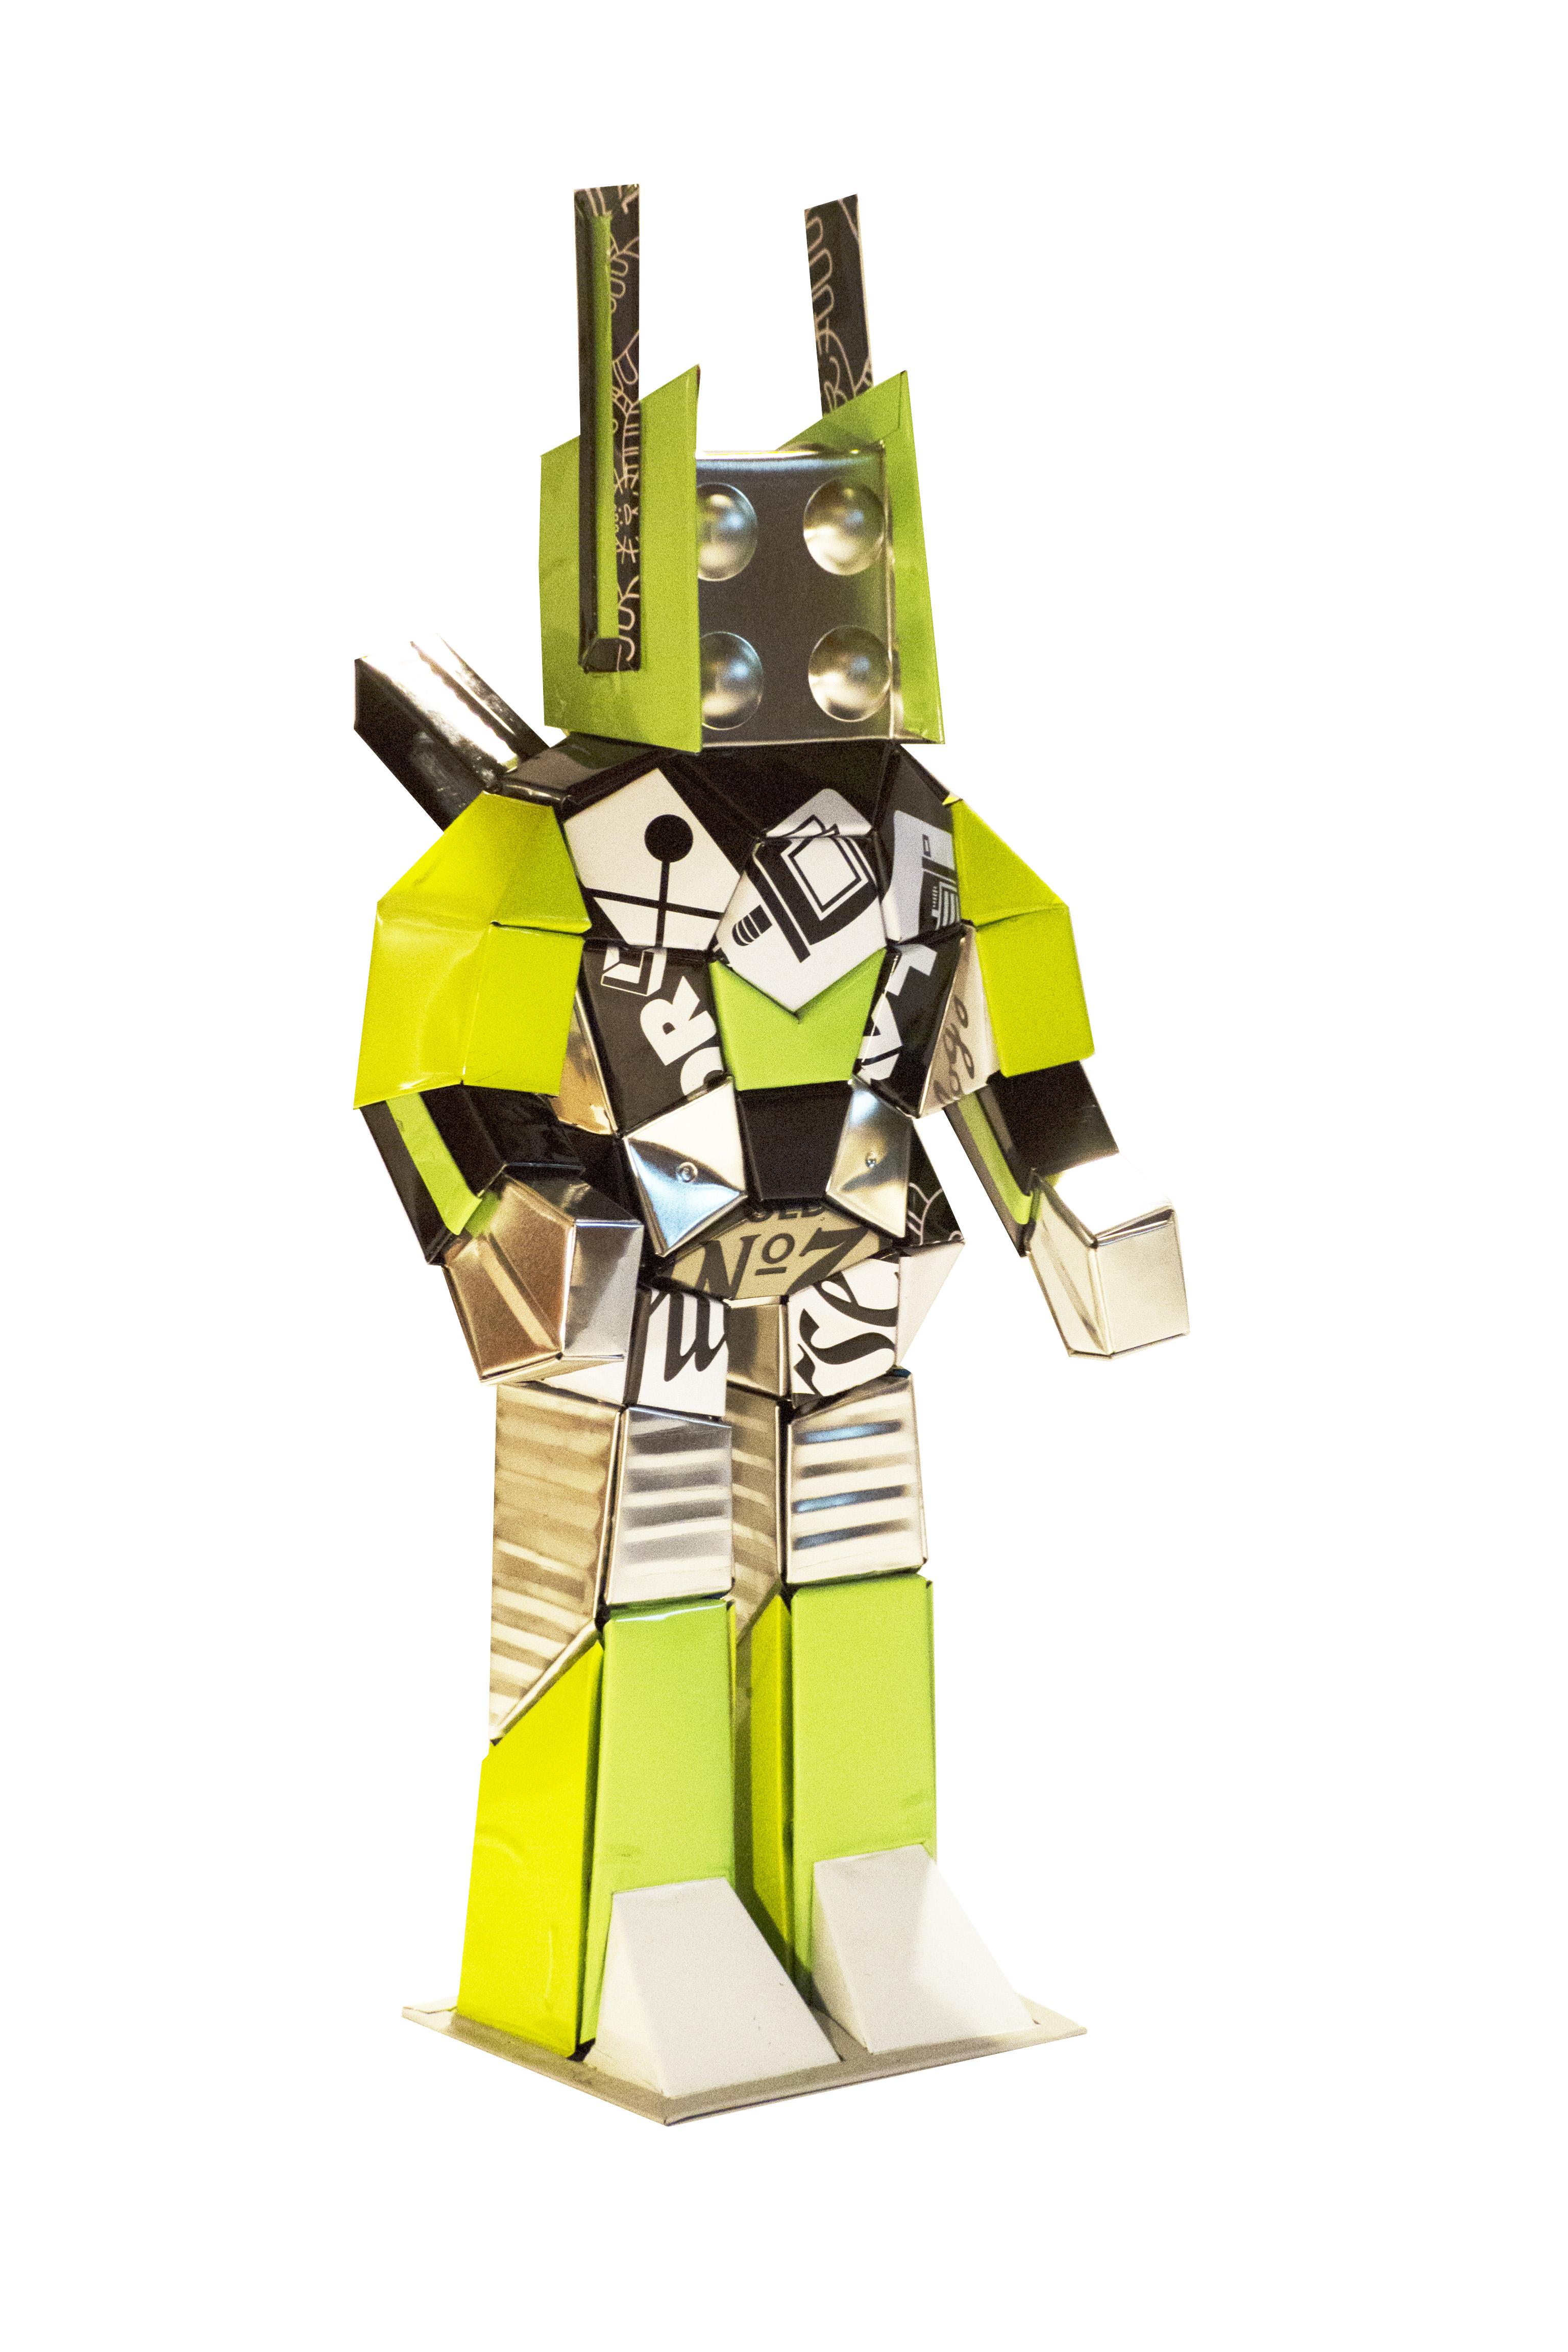 MID Robotyp Orla 2018 H:52CM